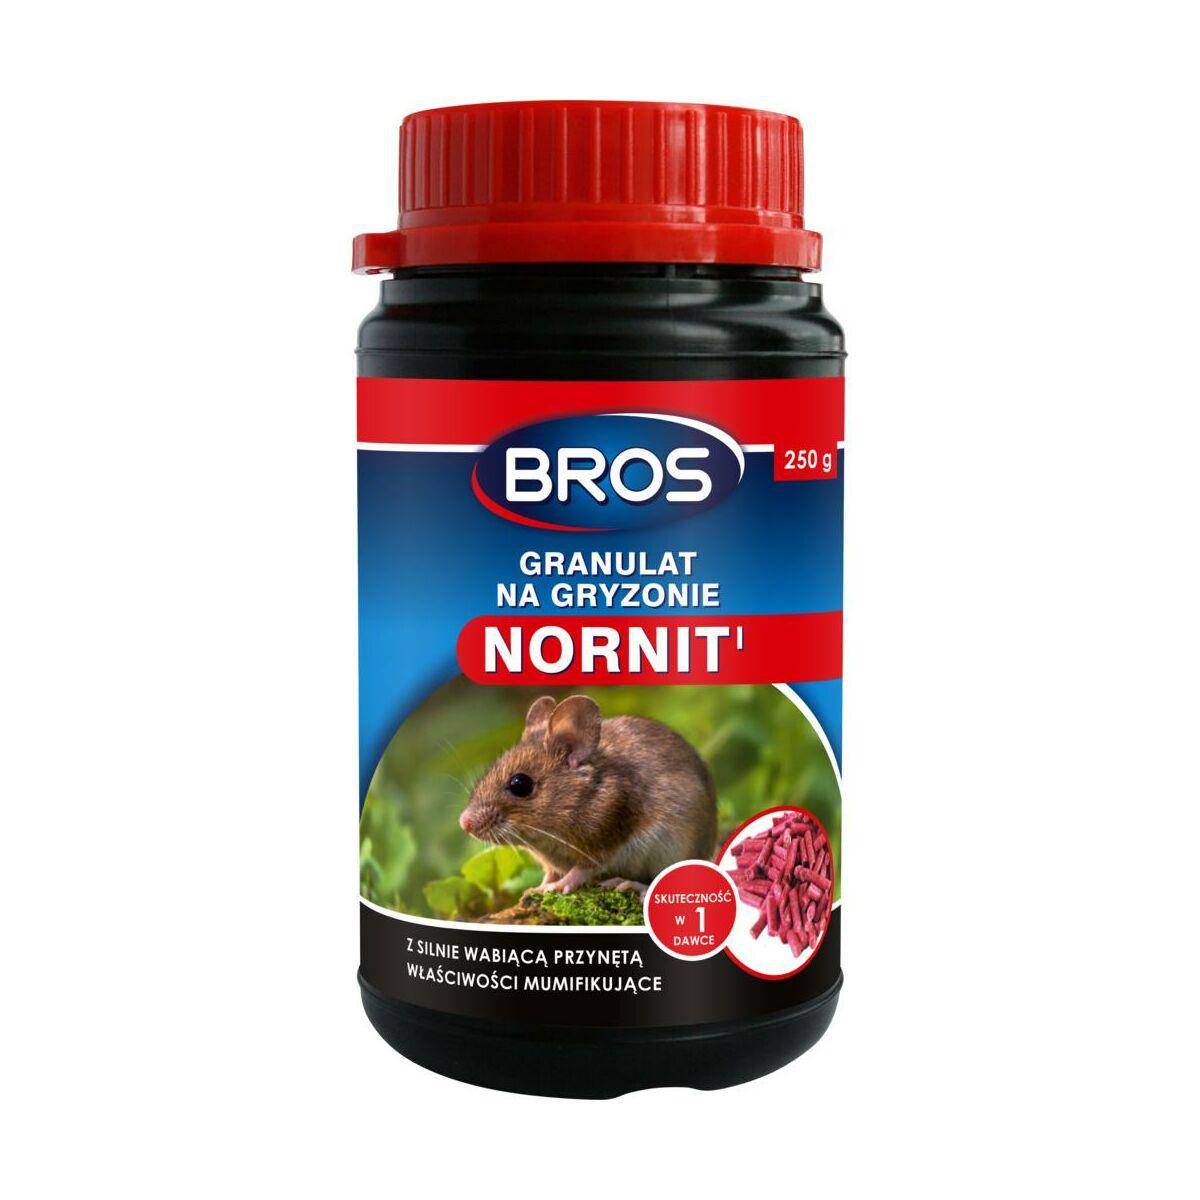 Granulat na gryzonie 250 g NORNIT BROS